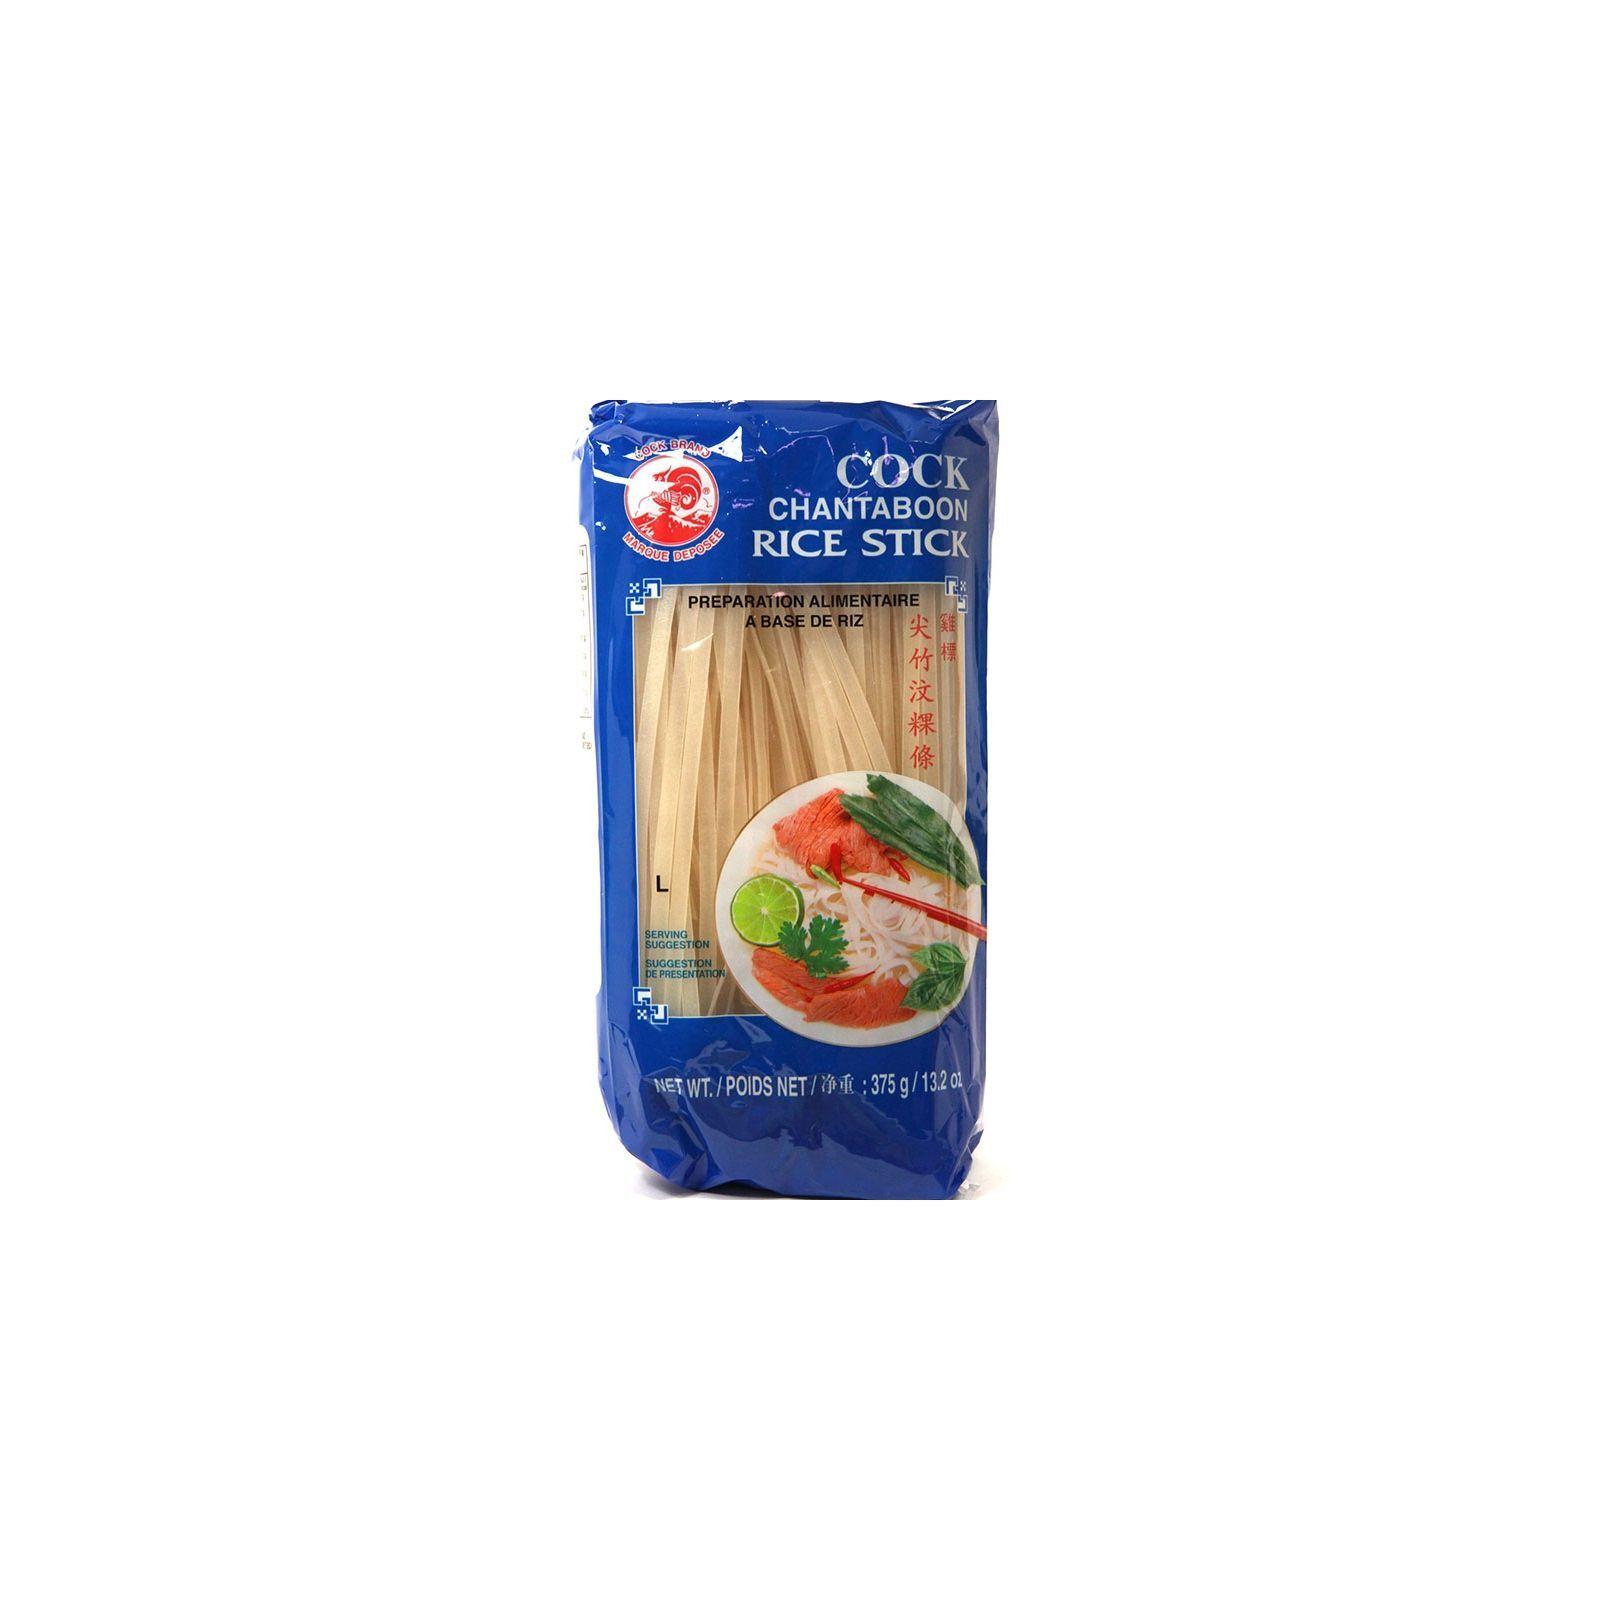 Asia Marché Pâte de riz Chantaboon 375g 5 mm